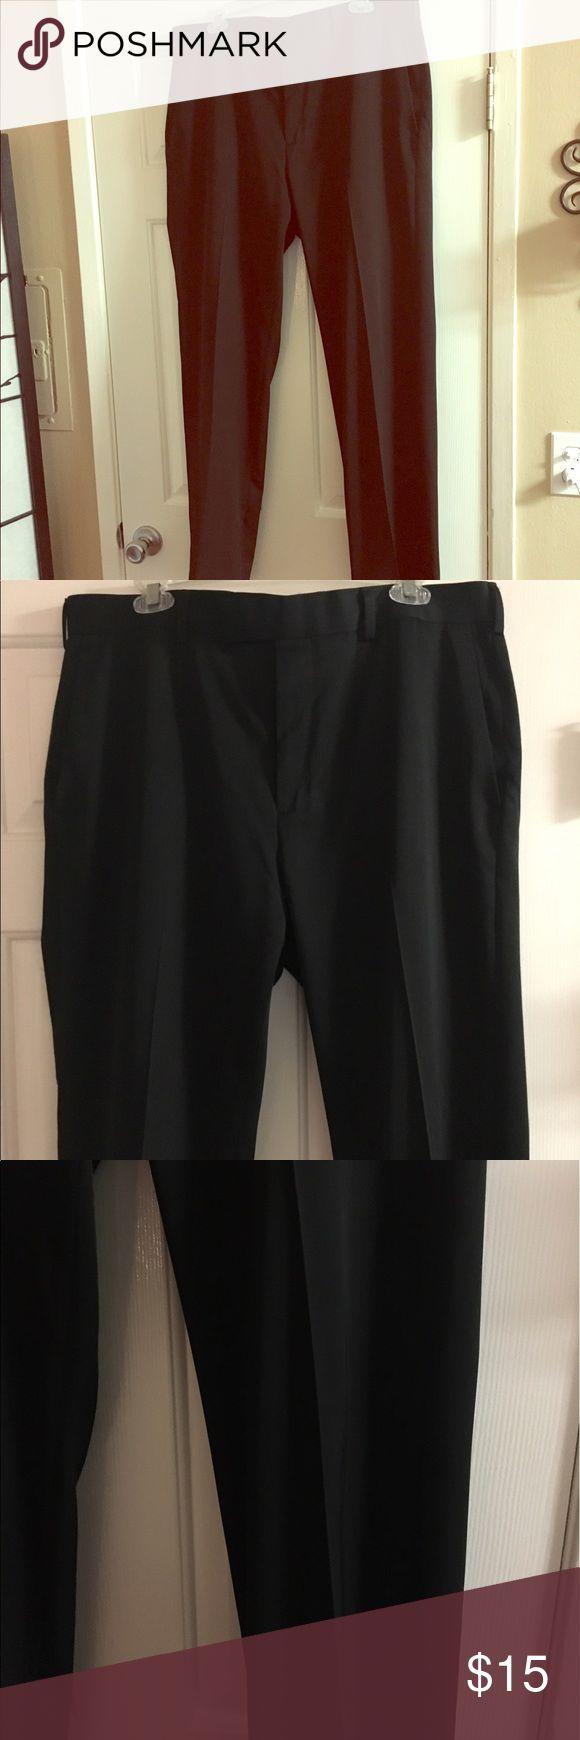 MENS BLACK SLACKS SIZE 36x32 AXIST MENS BLACK SLACKS.  GREAT CONDITION NO SIGNS OF WEAR. SIZE 36x32 axist Pants Dress